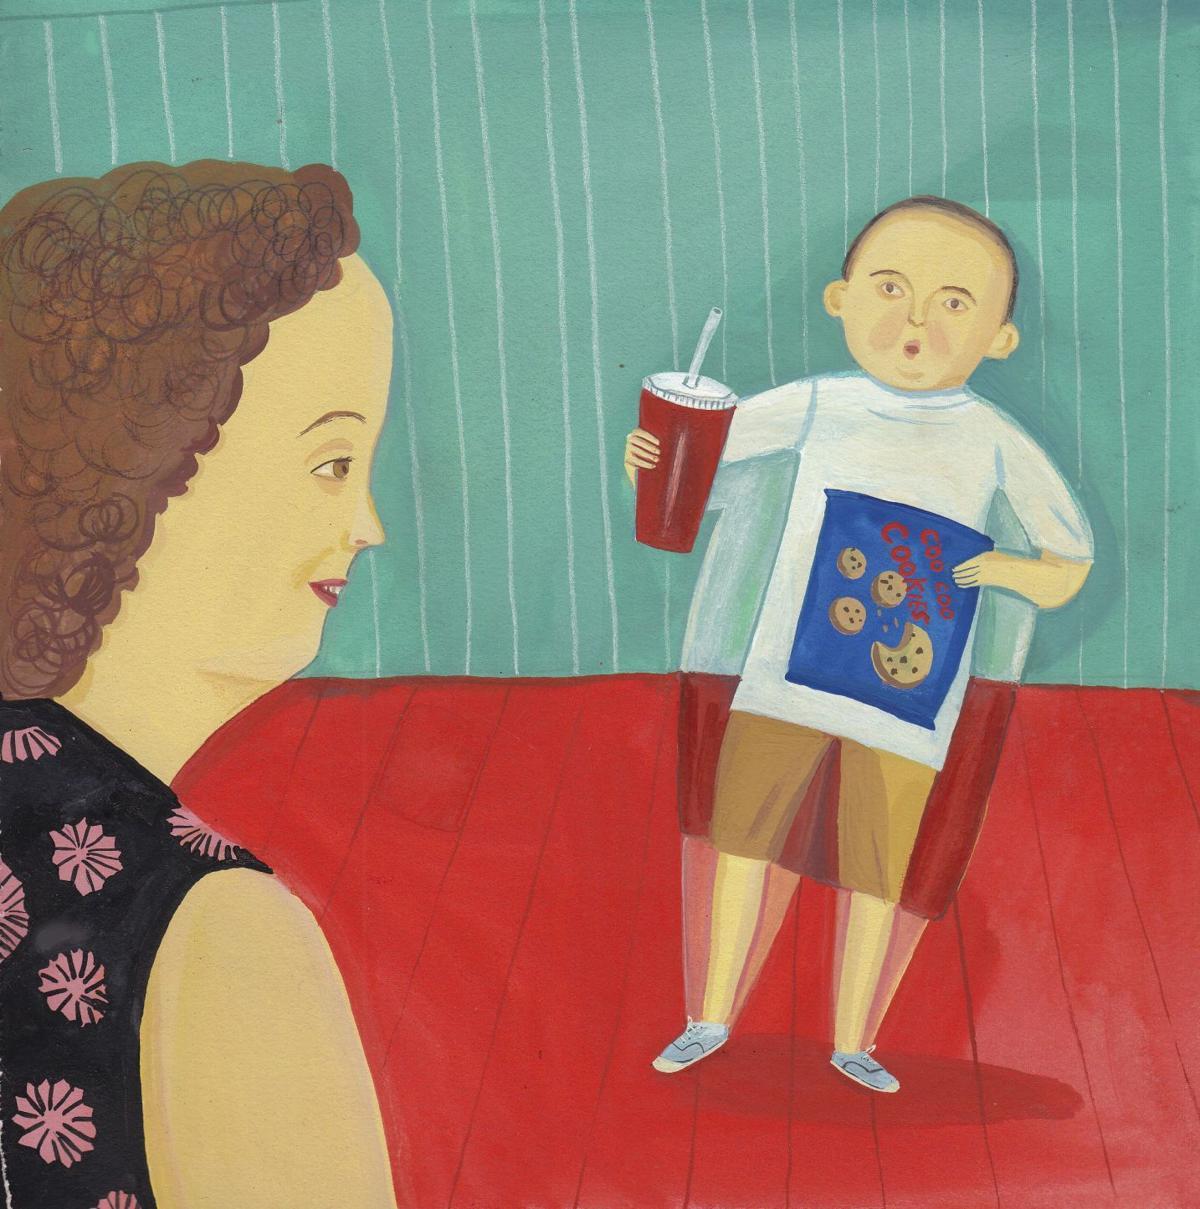 Parents' denial fuels childhood obesity epidemic